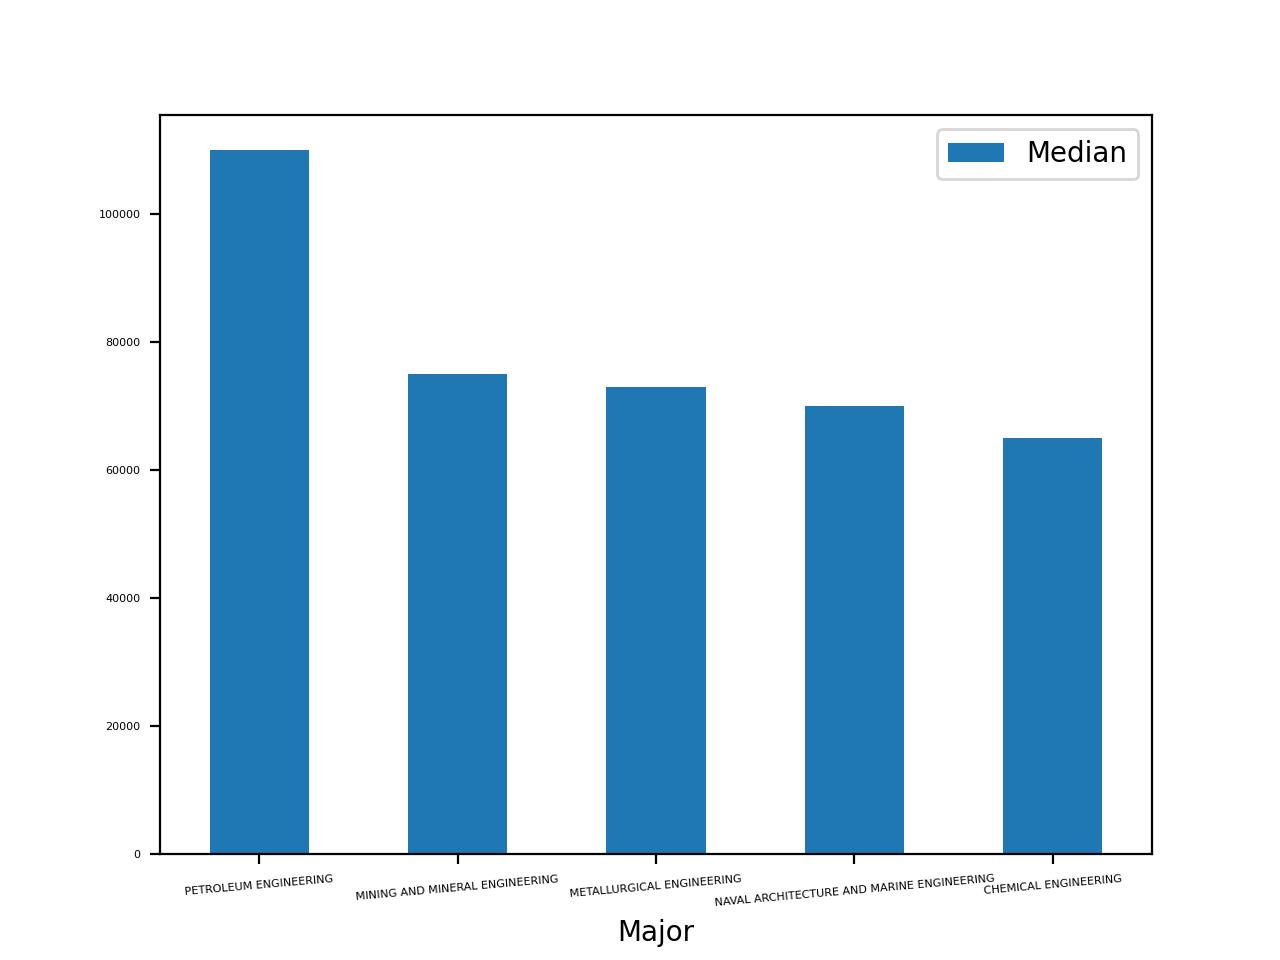 bar plot with top 5 median